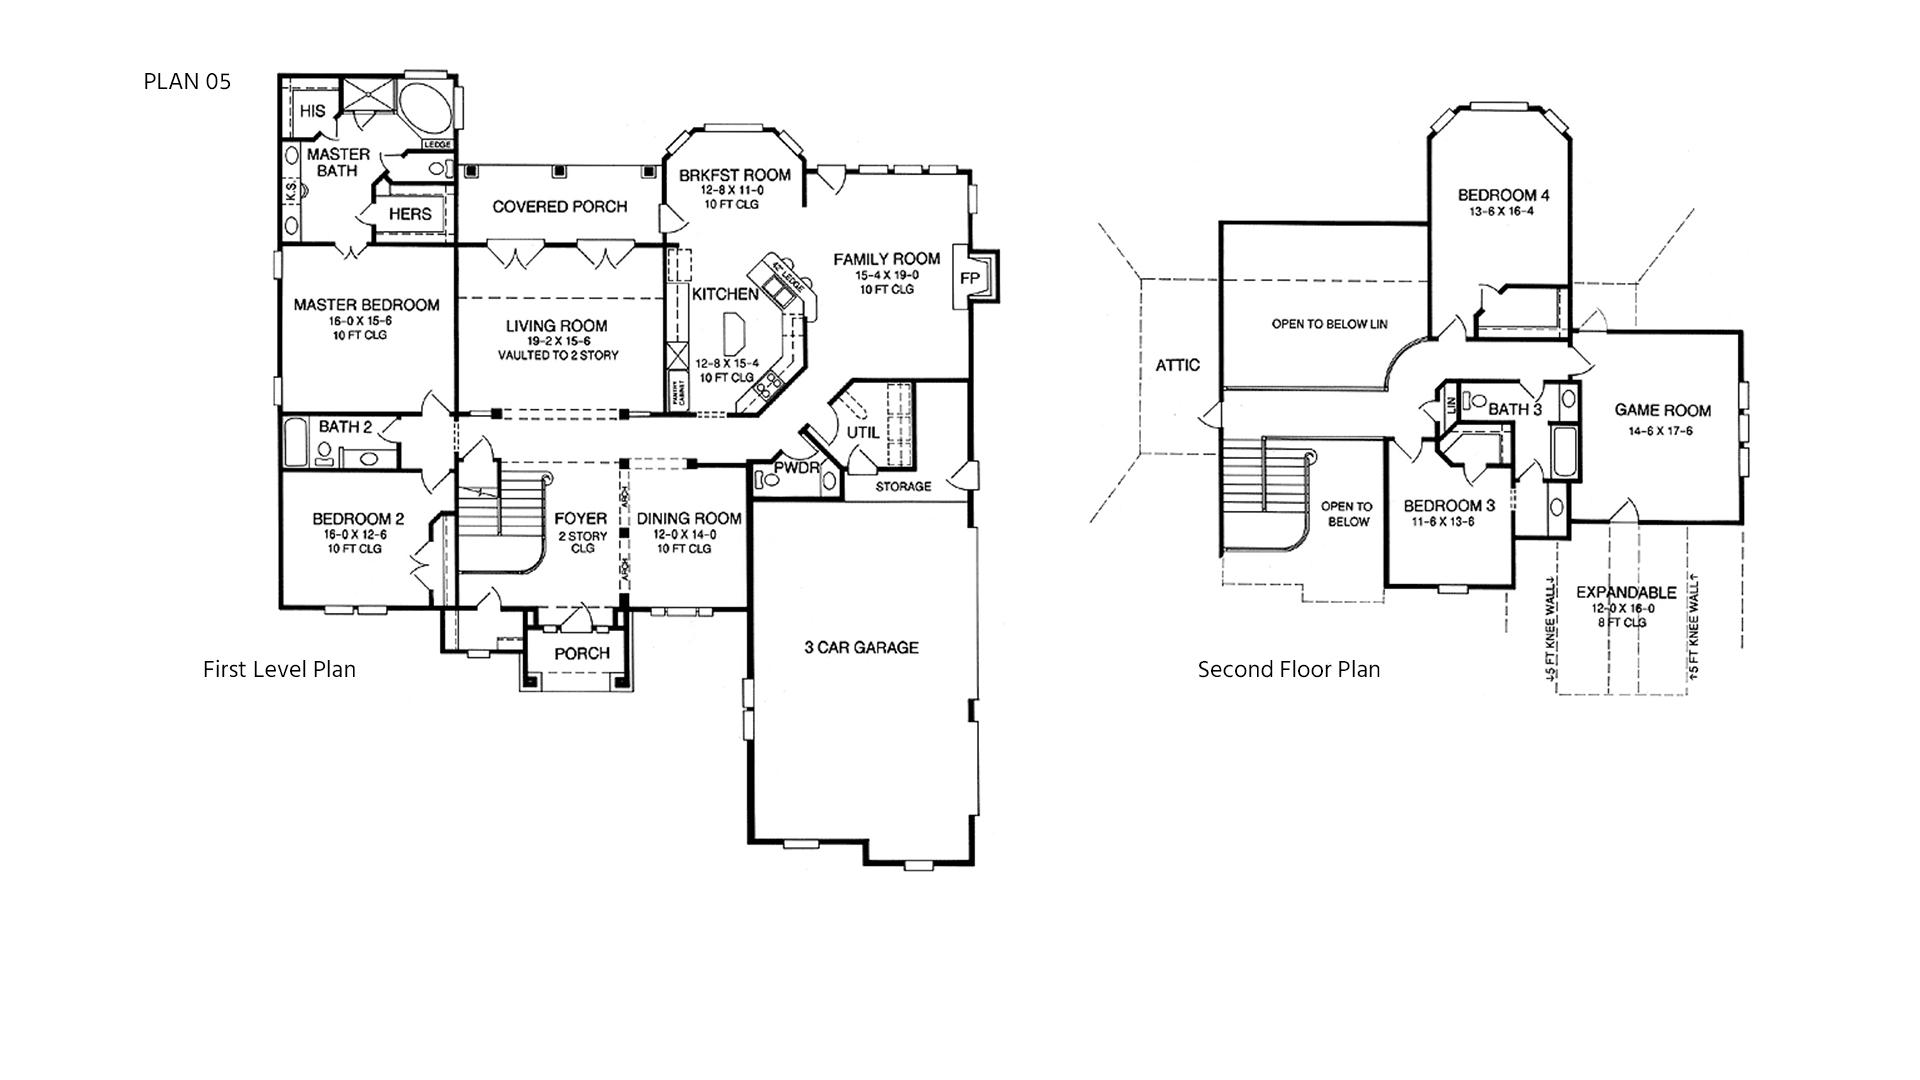 05 - home plan 1920 x 1080